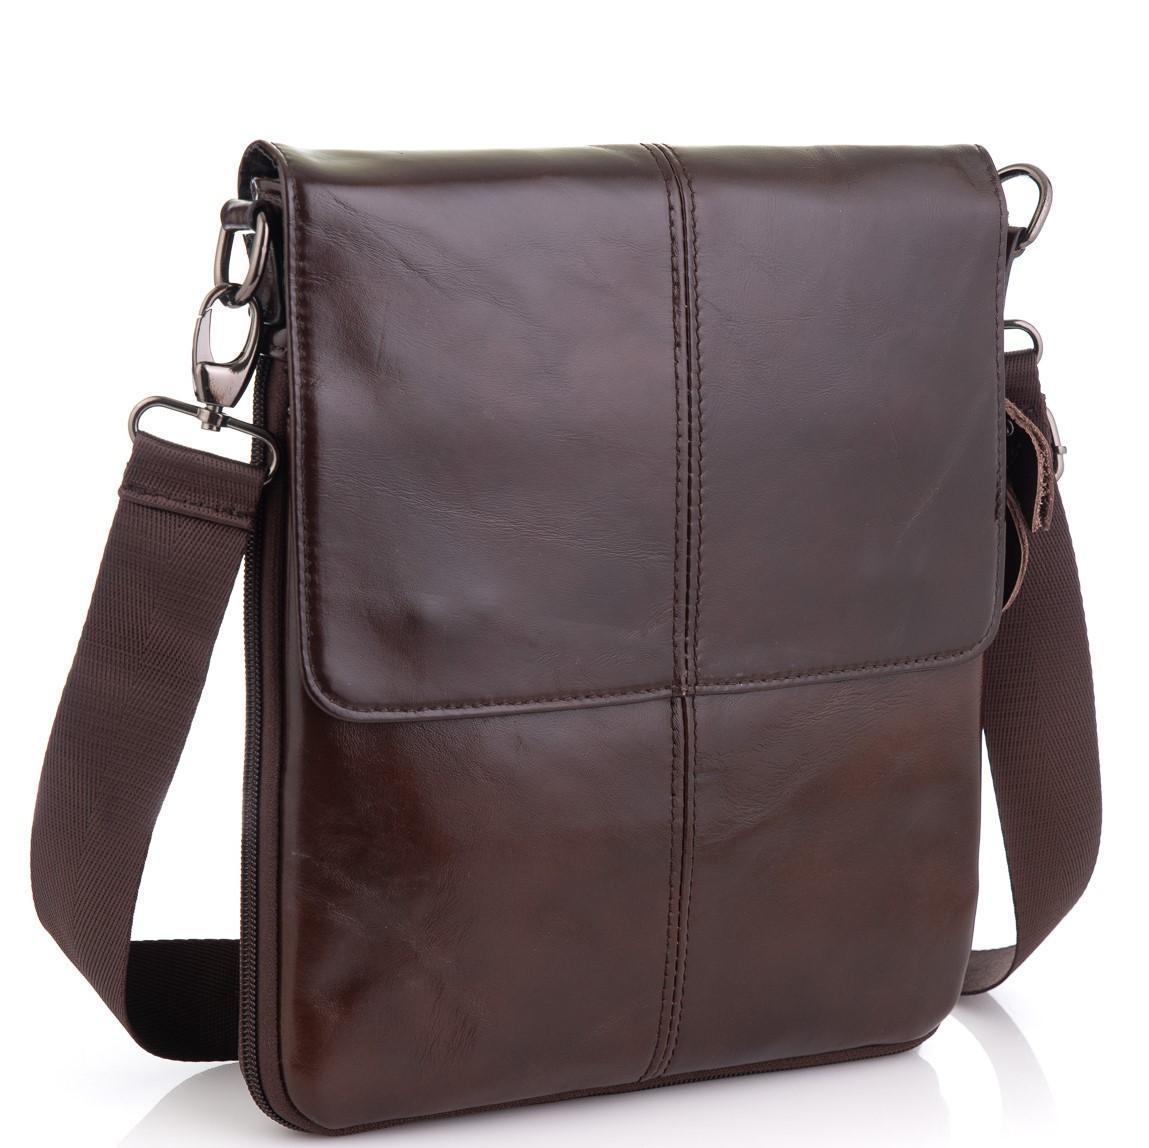 Мужская кожаная сумка через плечо мессенджер Bexhill BX8005C